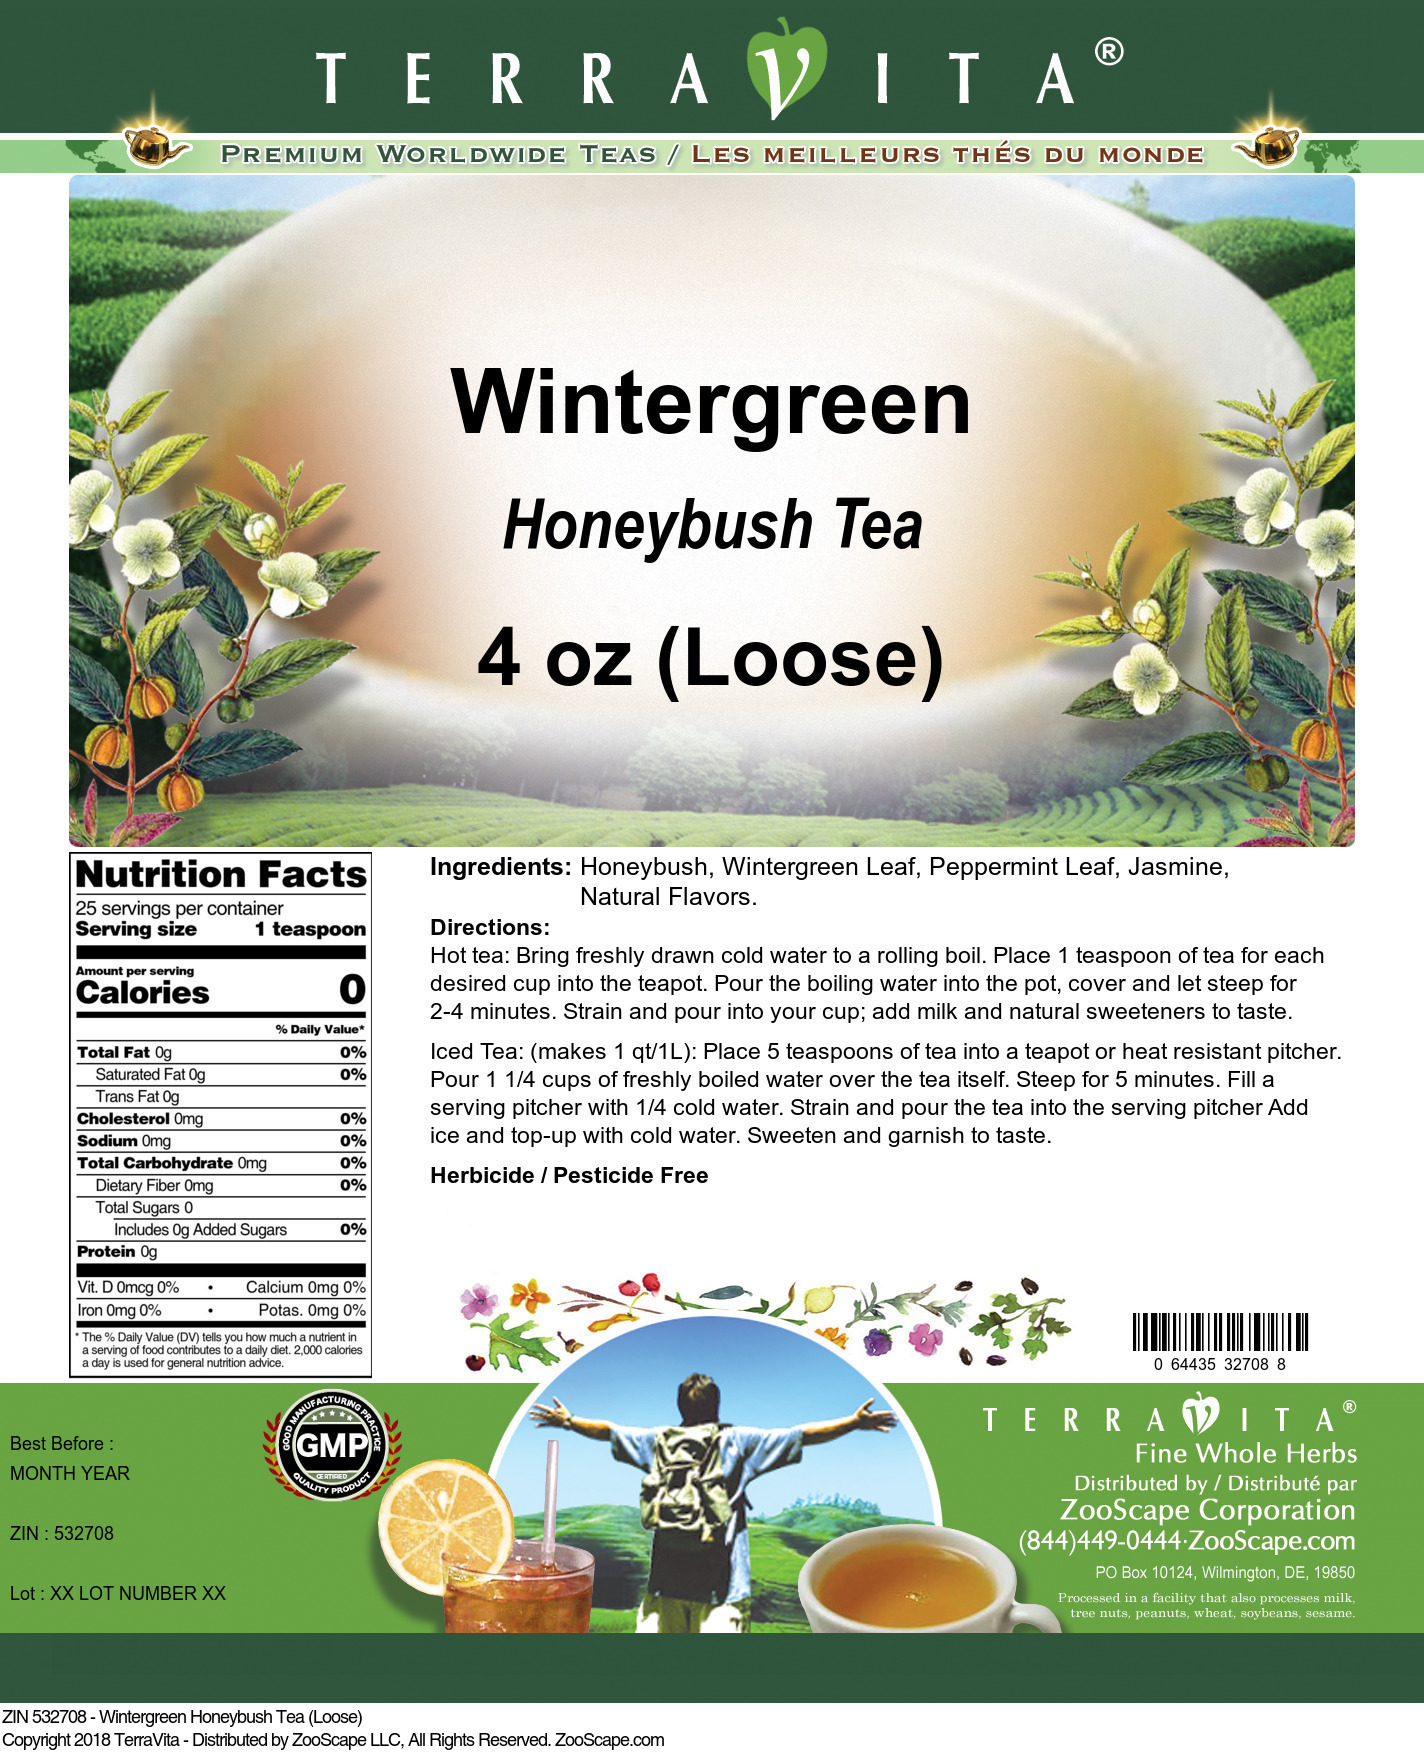 Wintergreen Honeybush Tea (Loose)